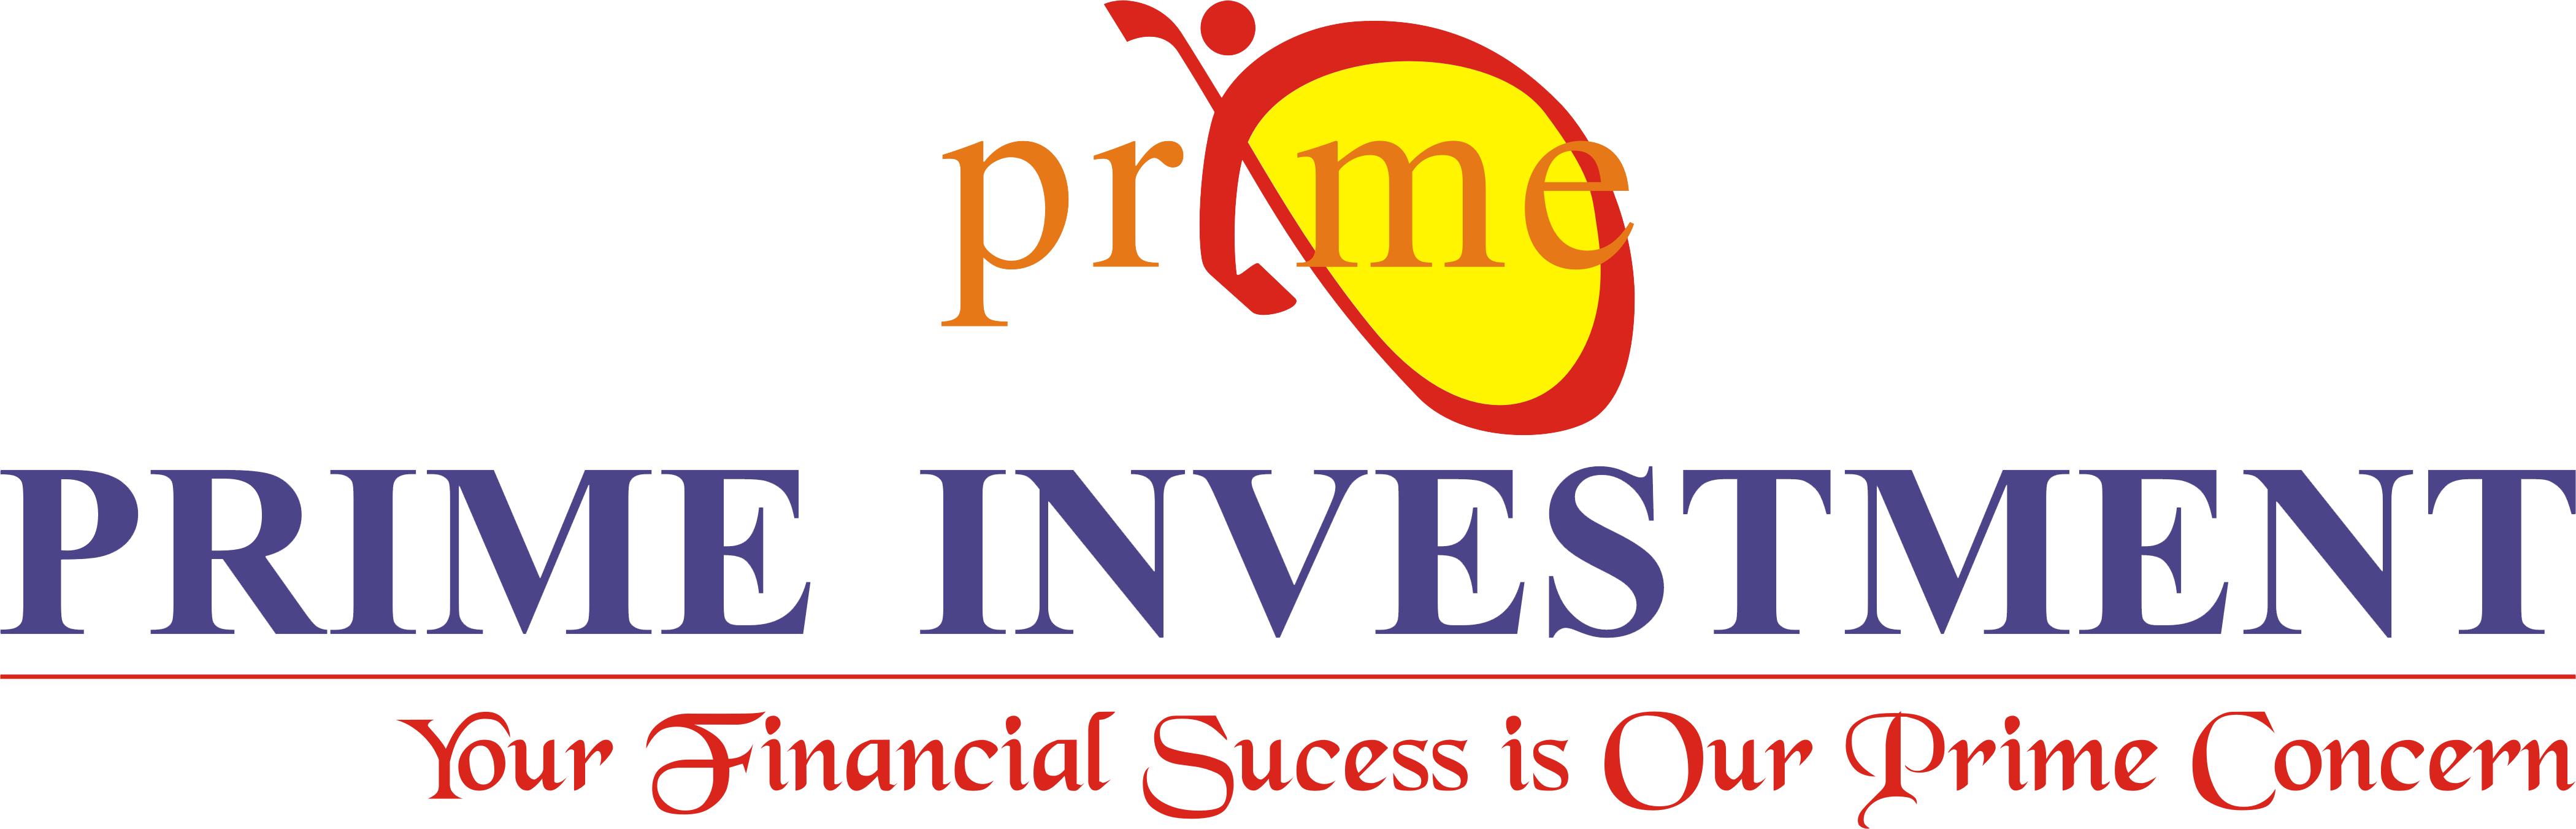 Prime Investment - logo